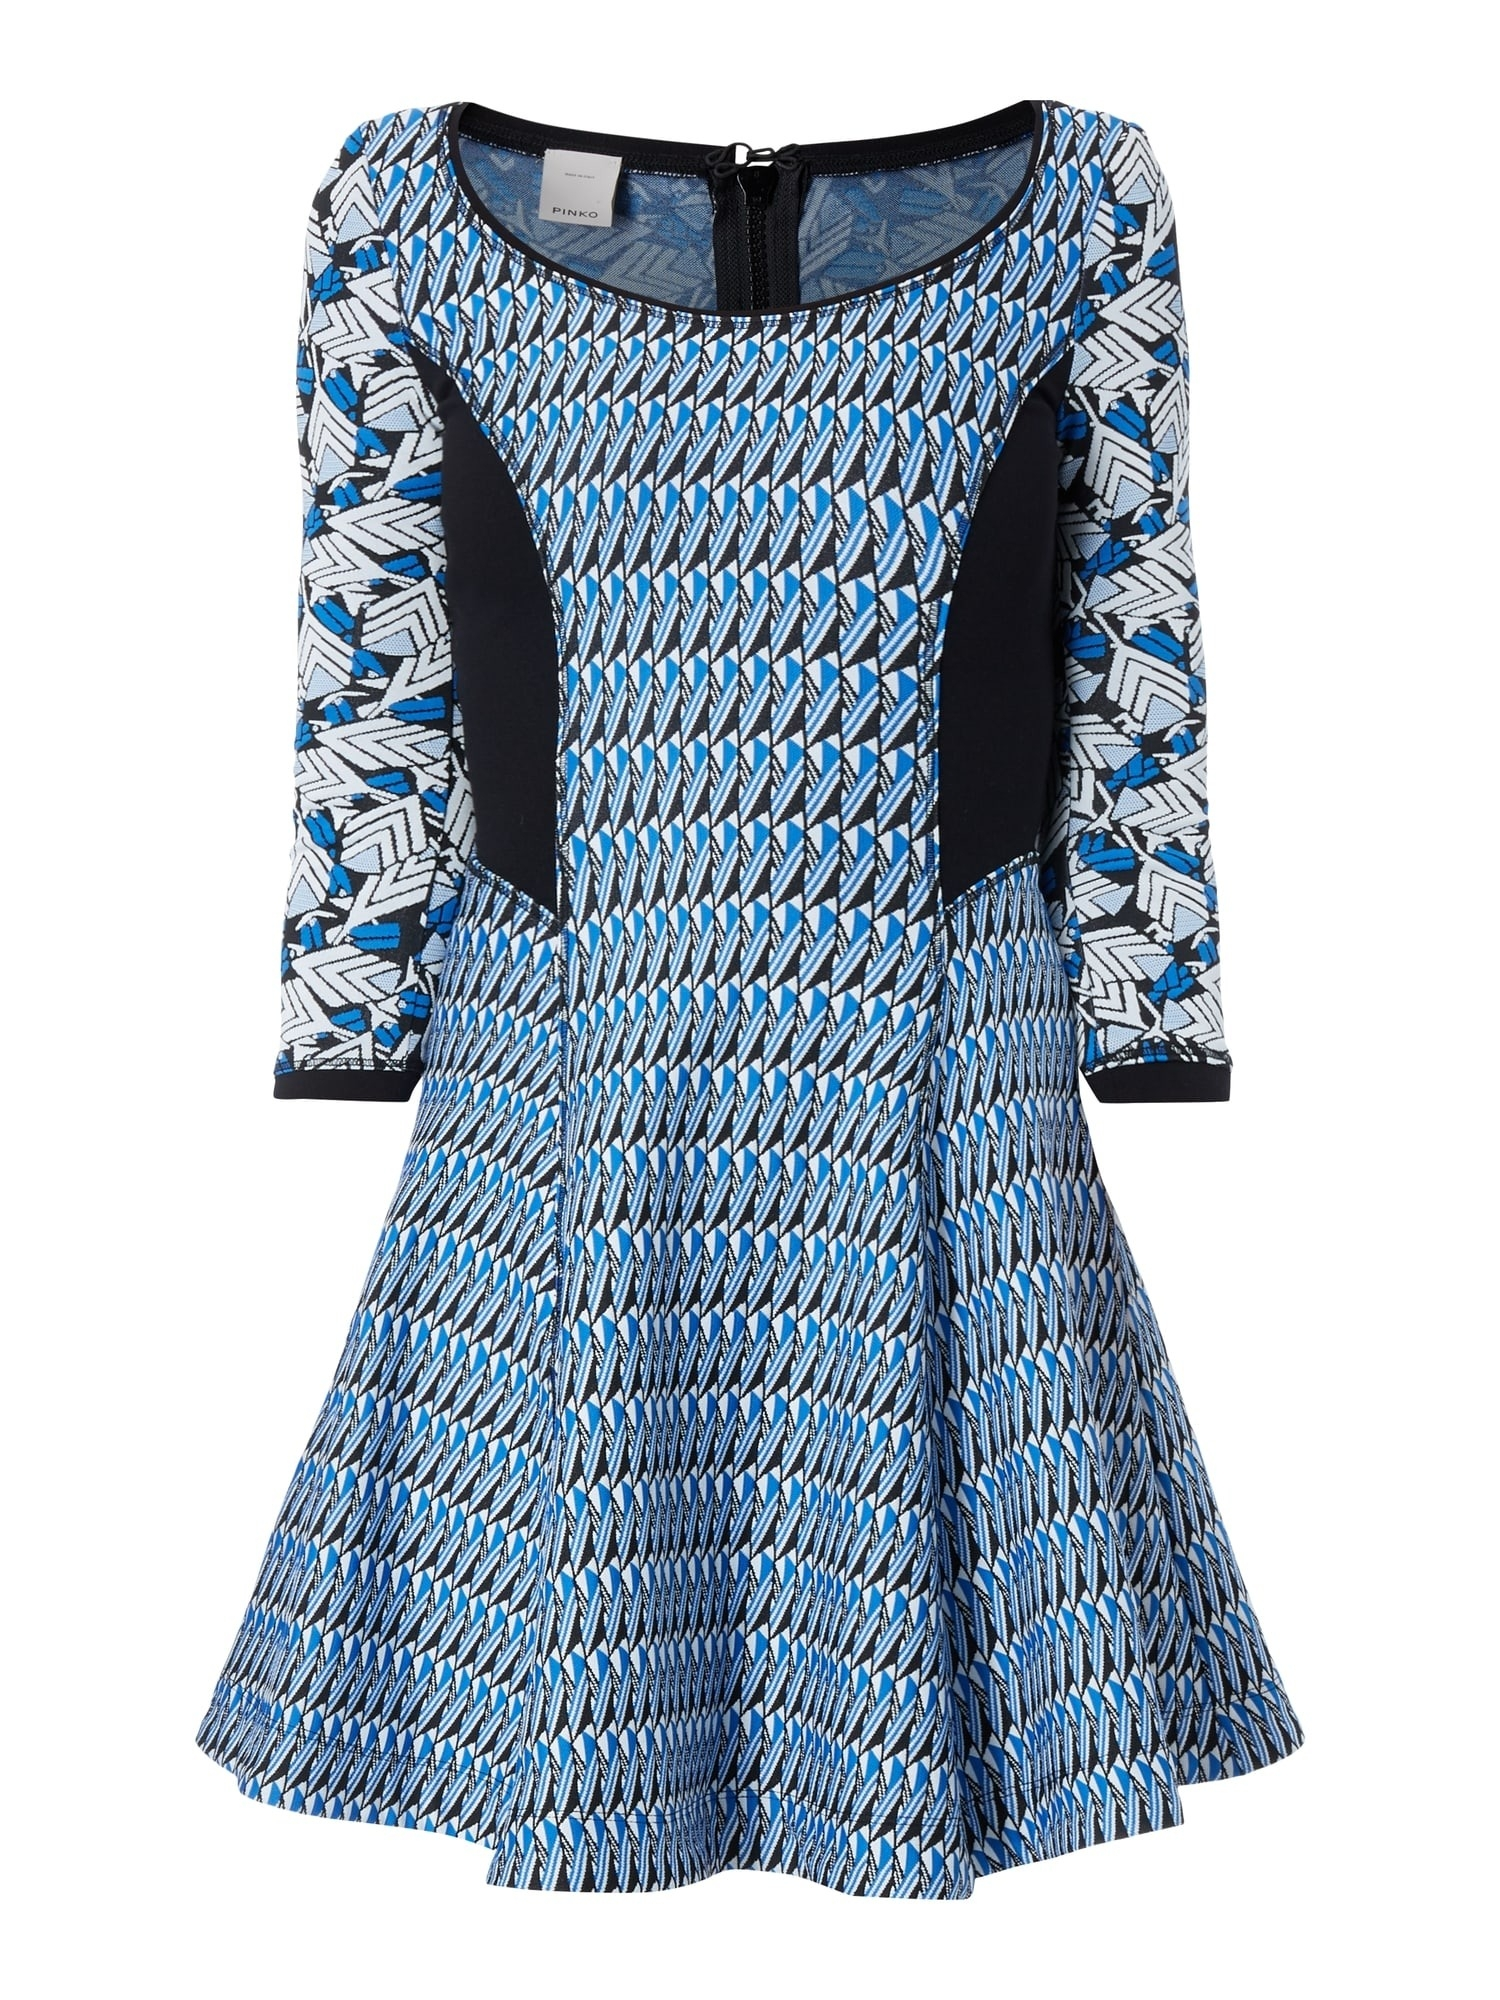 Designer Luxus Damen Kleid Türkis VertriebFormal Coolste Damen Kleid Türkis Boutique